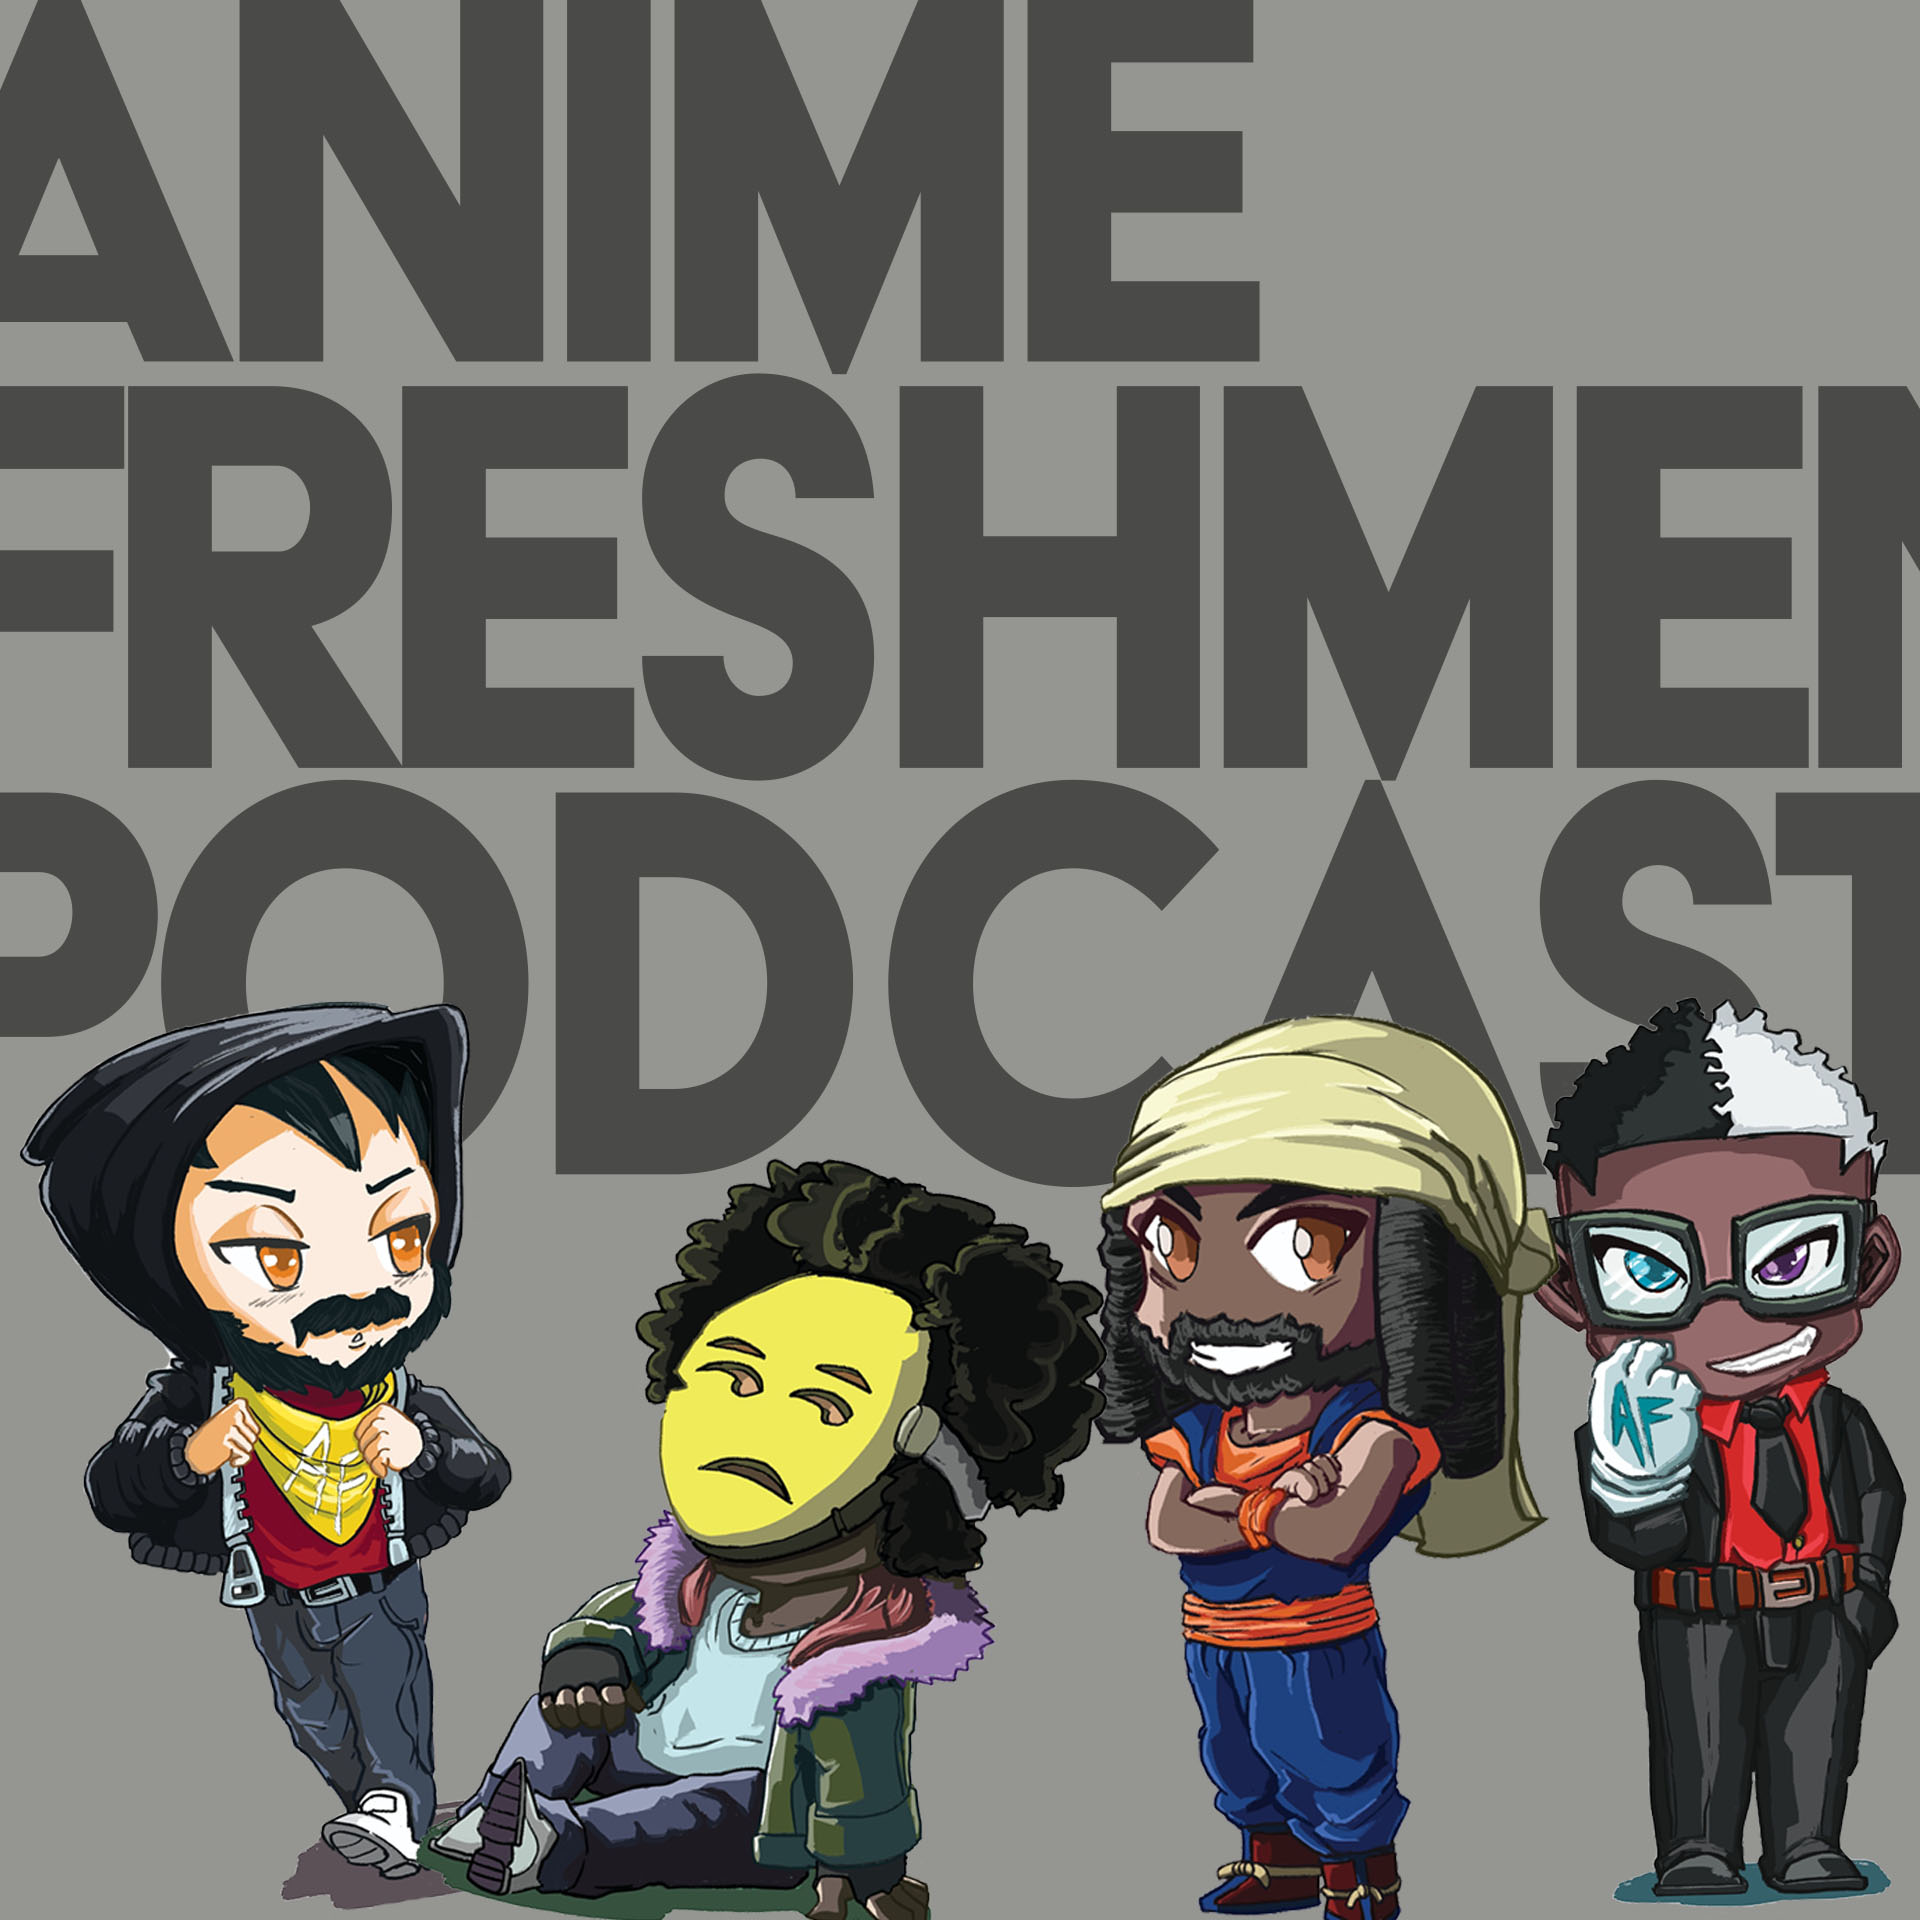 The Anime Freshmen Podcast show art